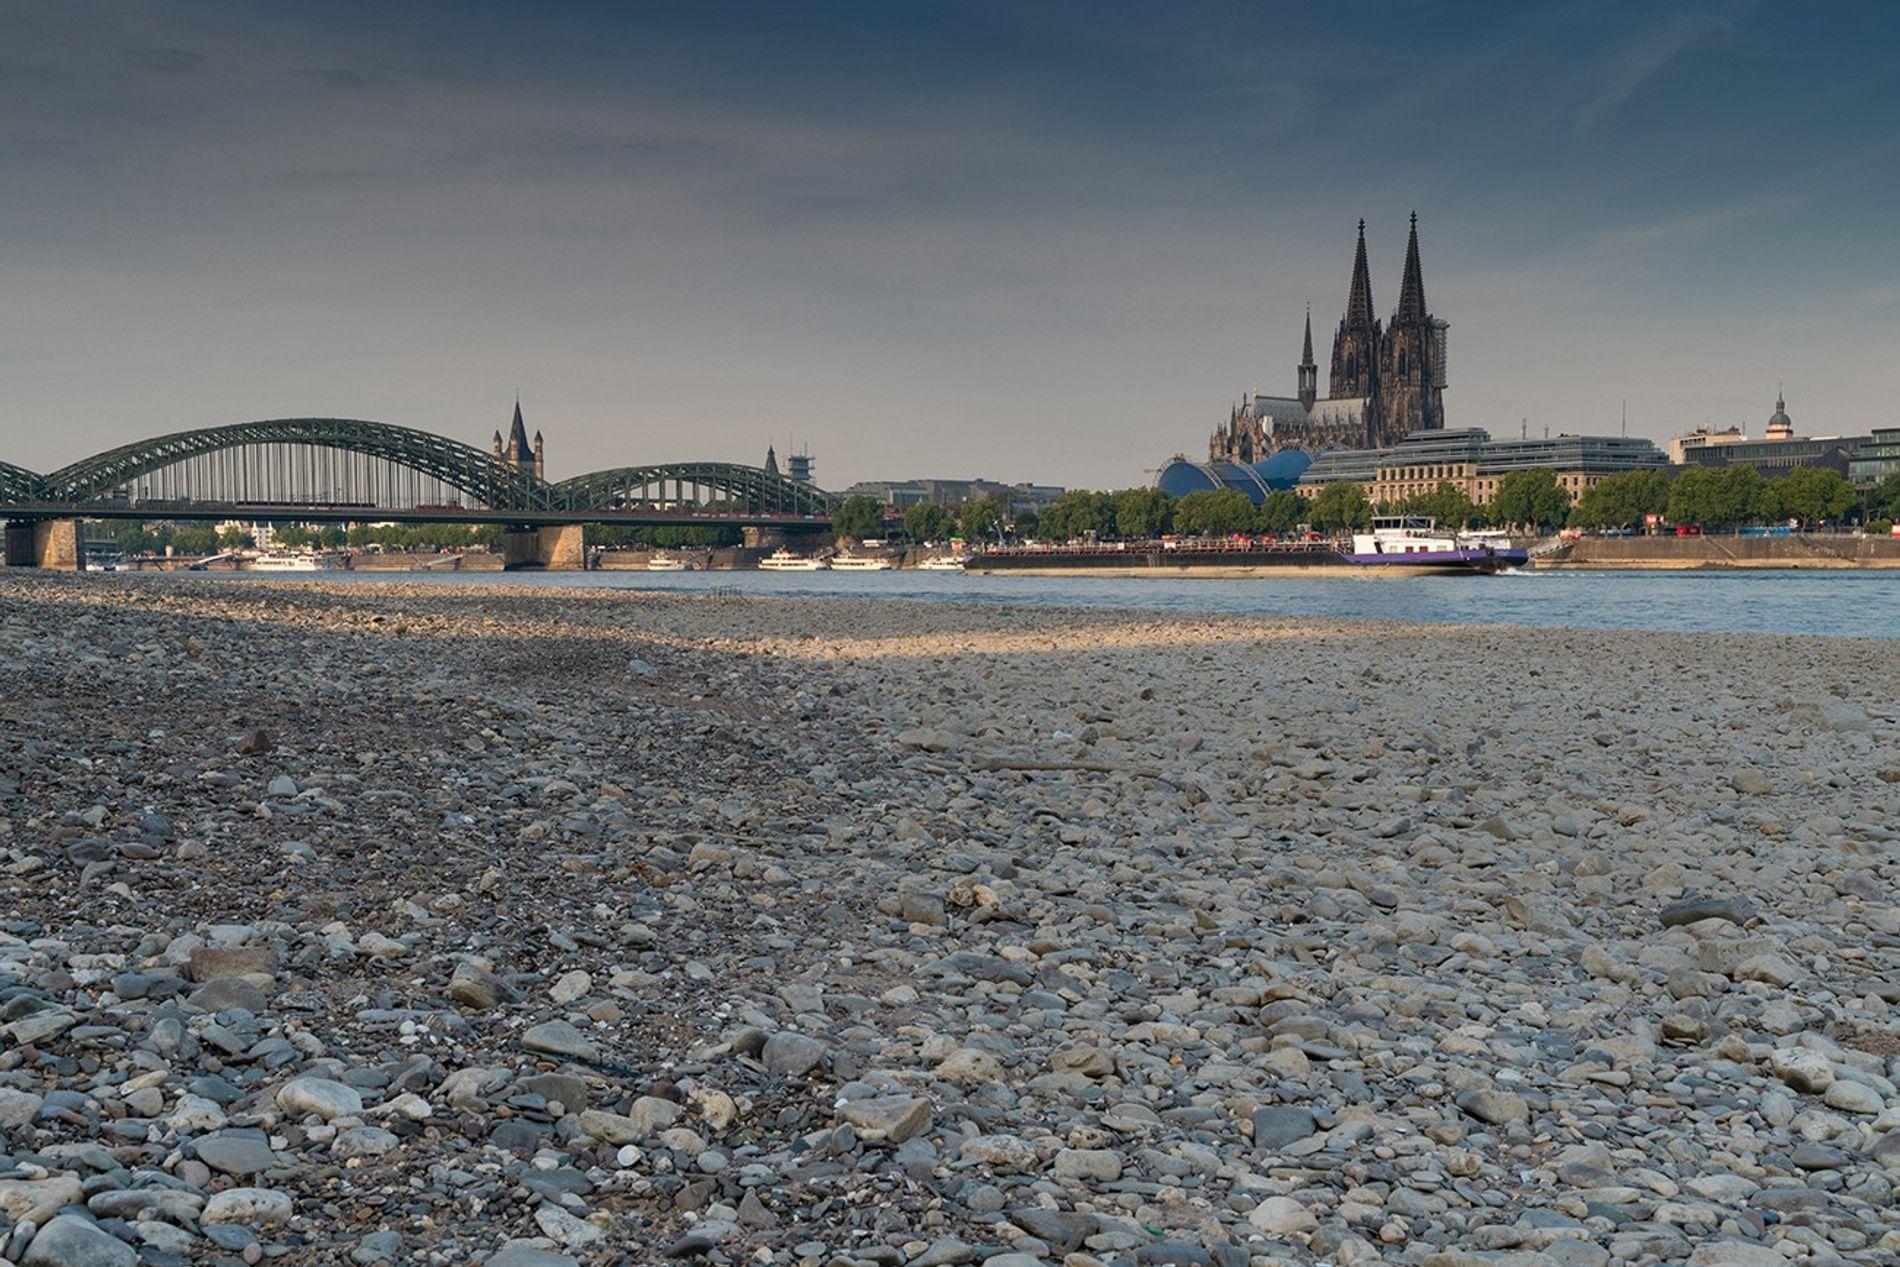 Niedrigwasser am Rhein in Köln.